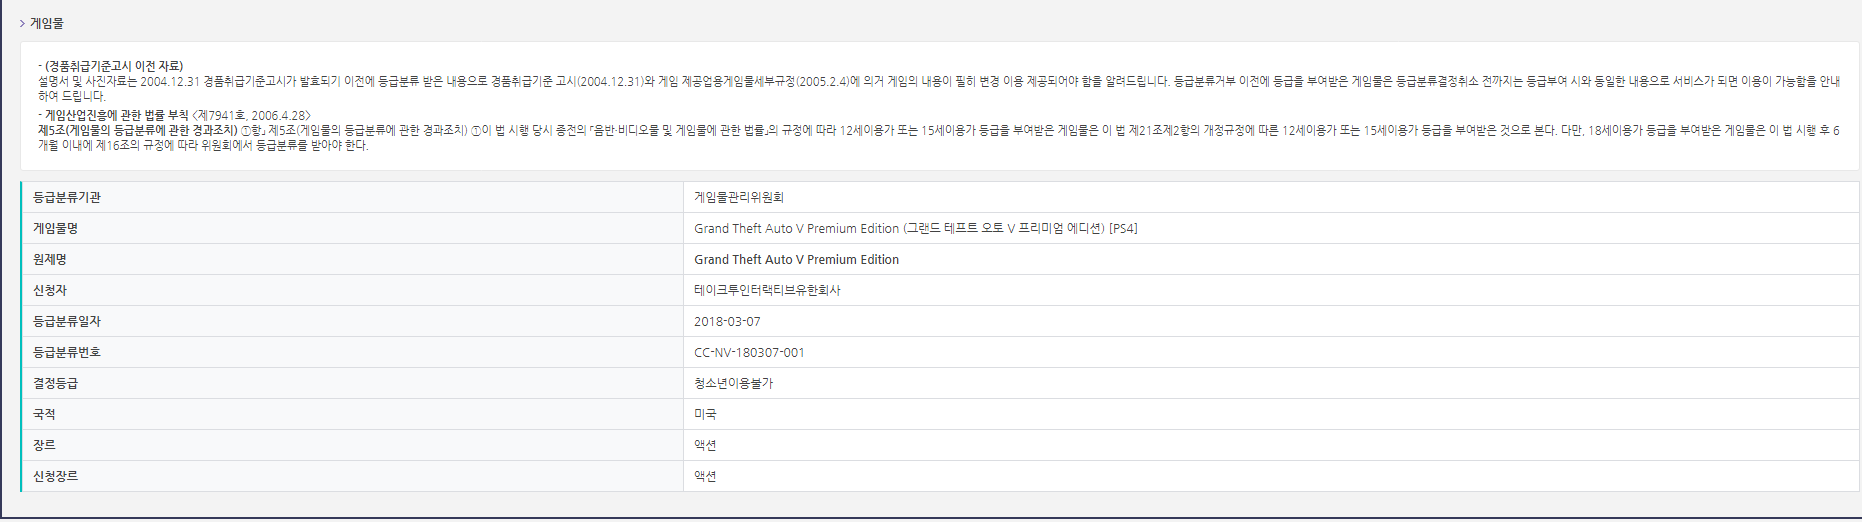 Grand Theft Auto V Premium Edition es catalogado en Corea 2